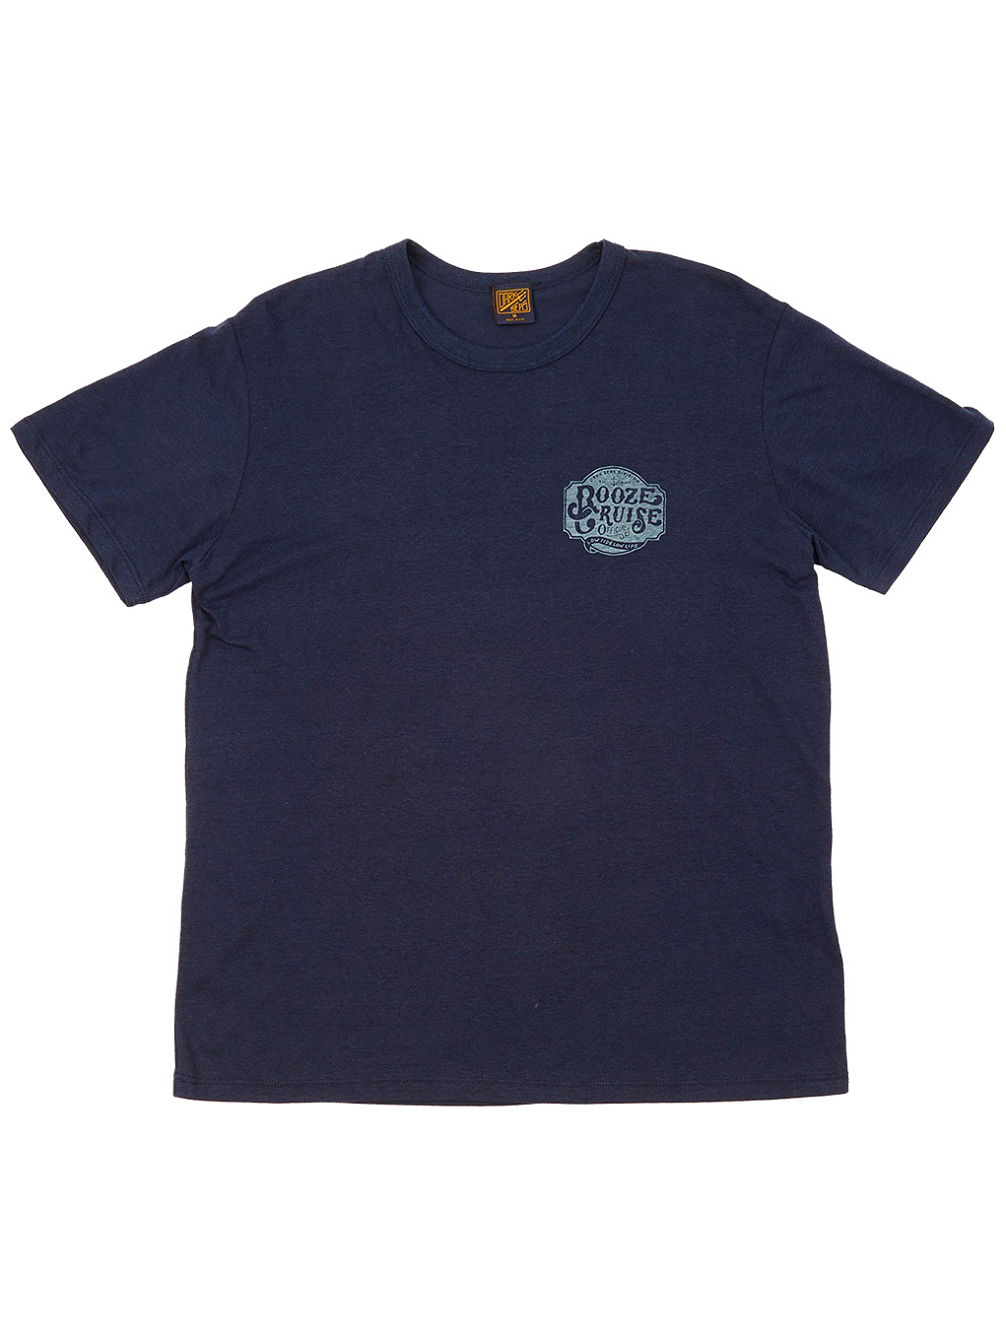 booze-cruise-t-shirt